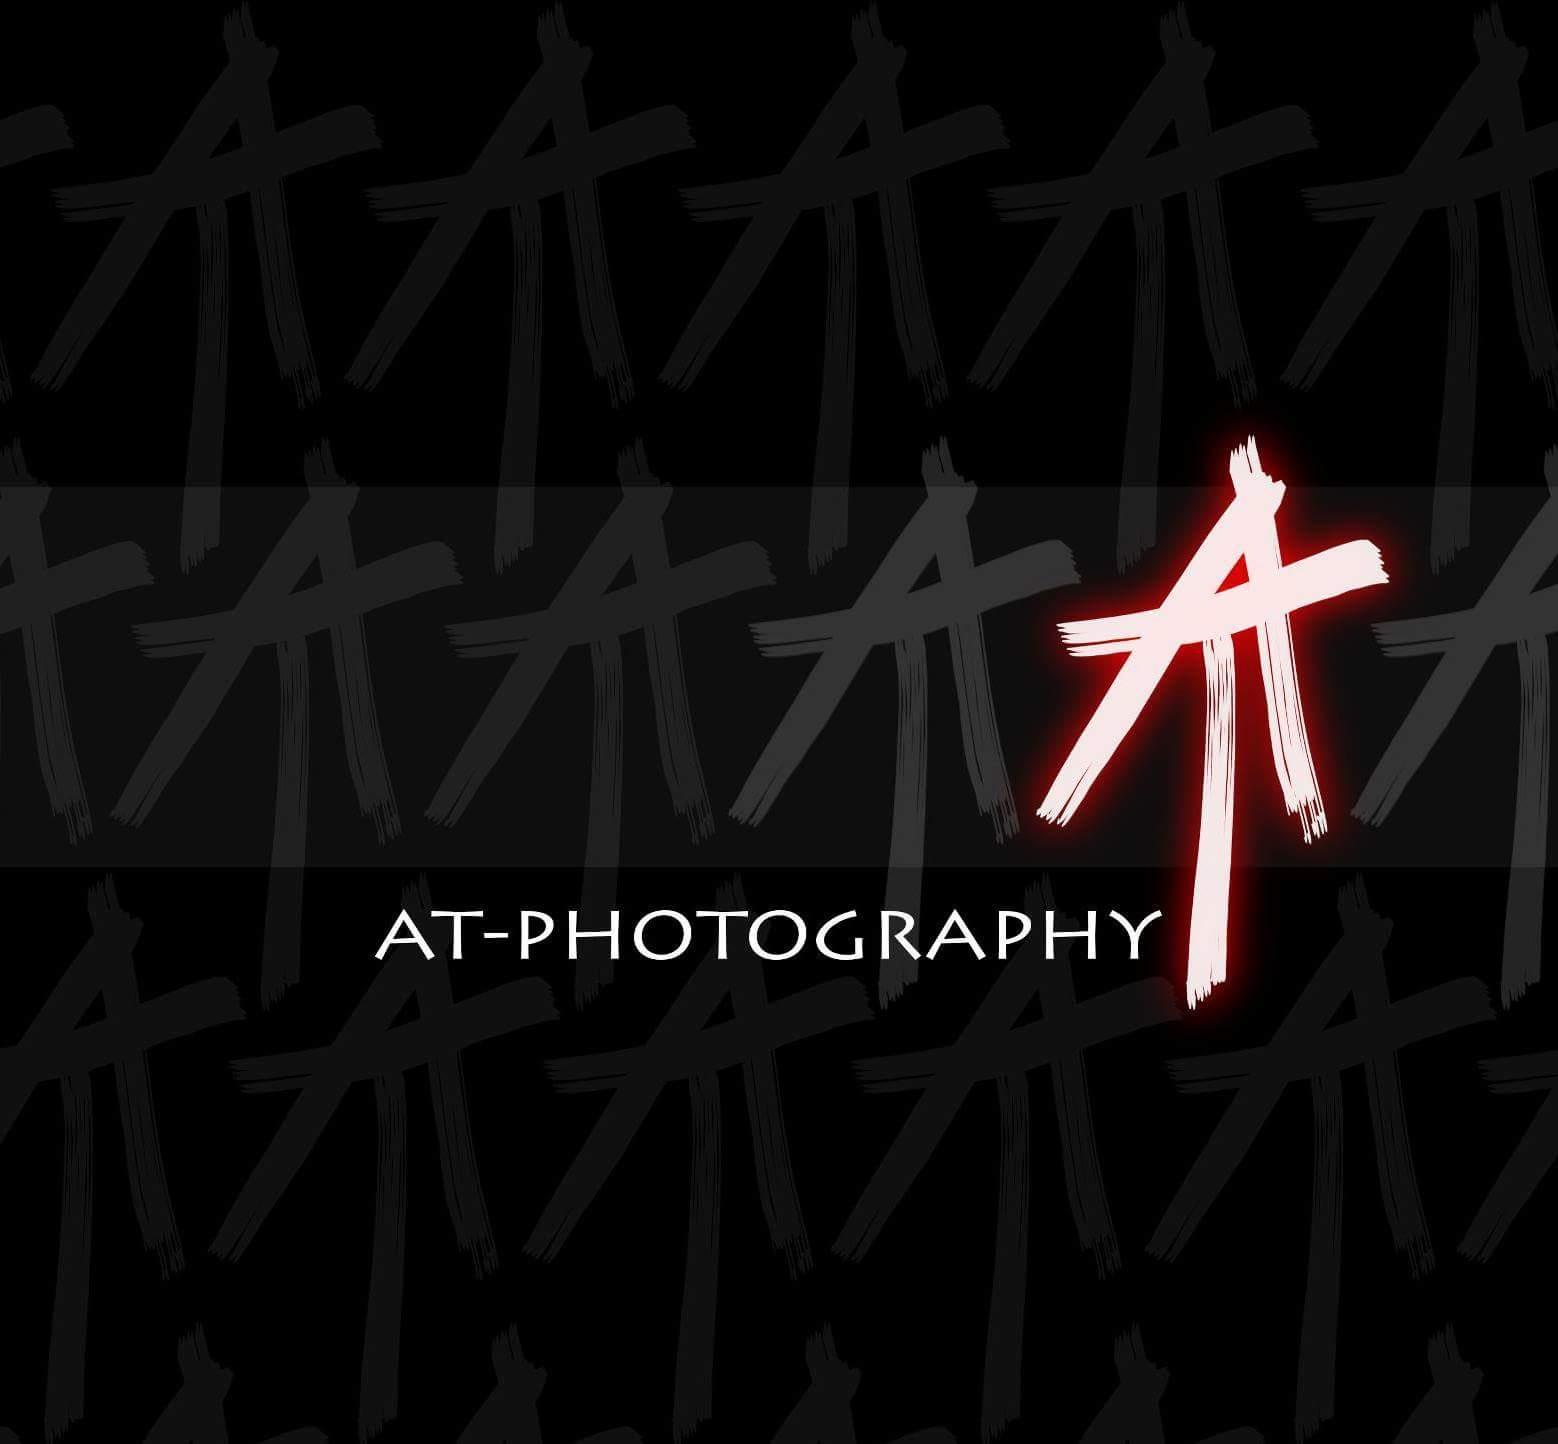 AT-Photography